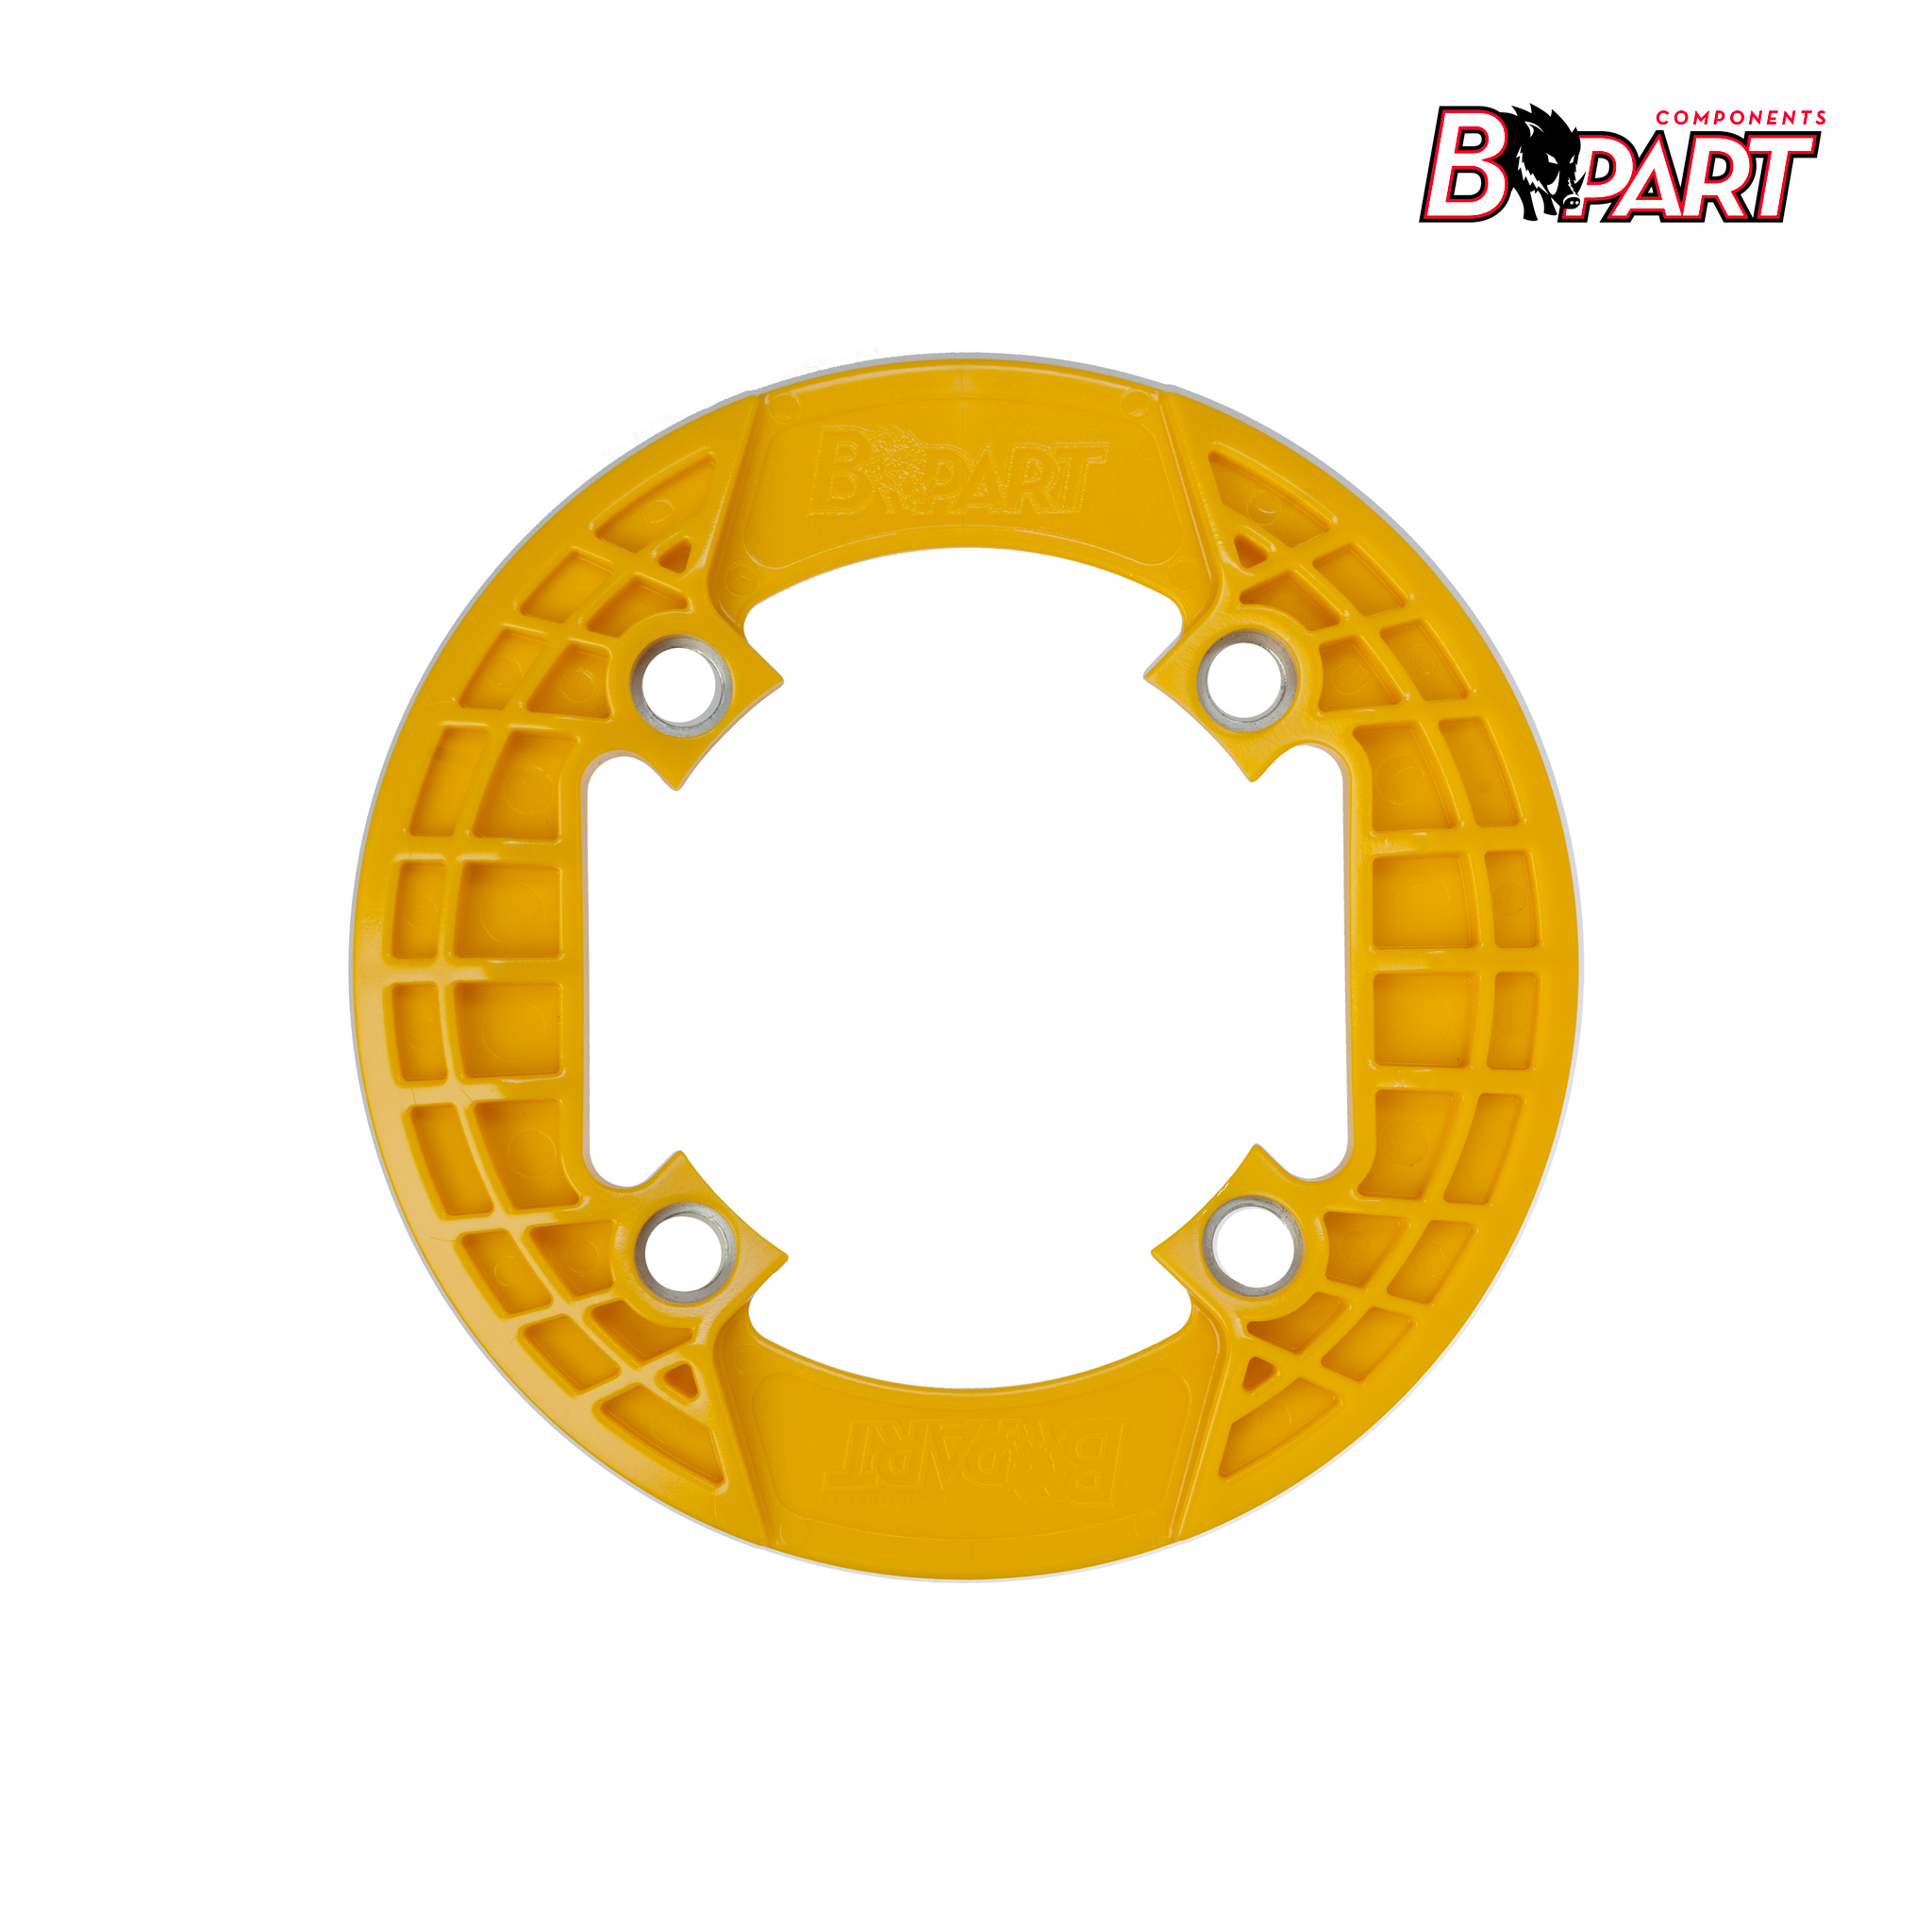 Bpart Components cubreplatos amarillo